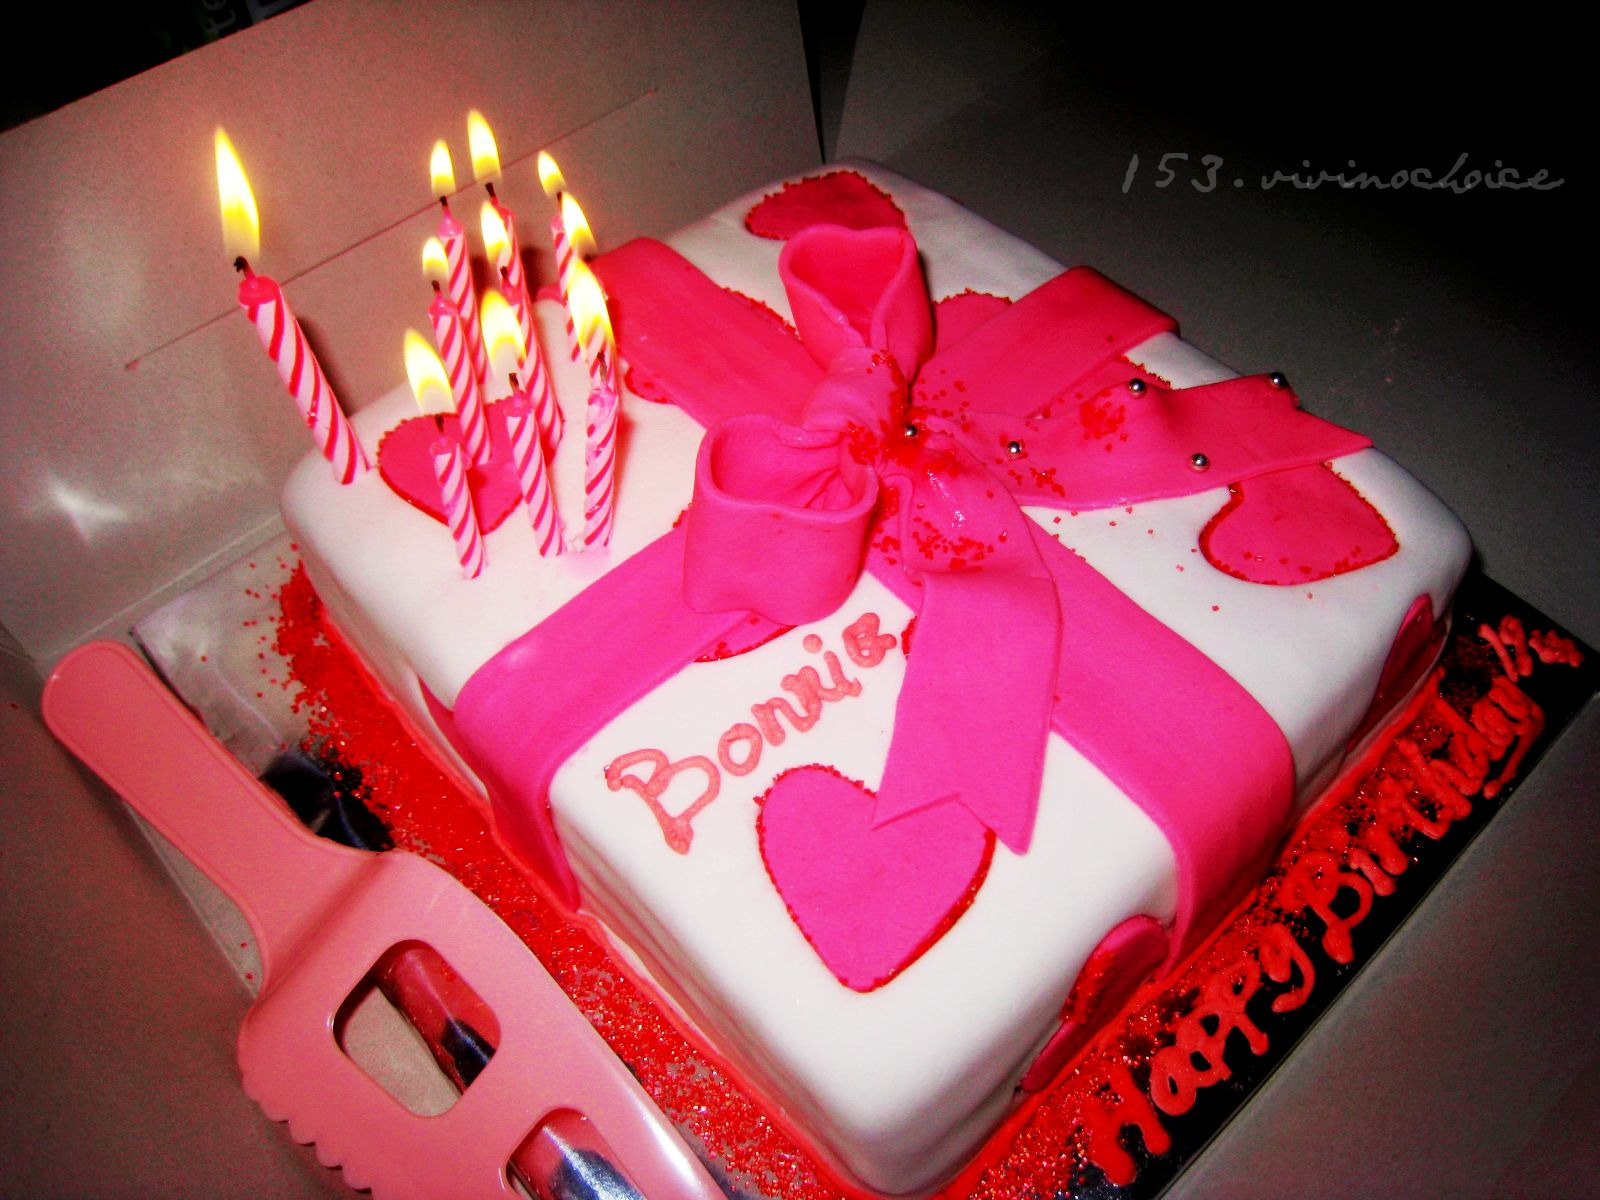 o choc happy birthday bonnie her birthday cake handmade by joan clap clap publicscrutiny Gallery